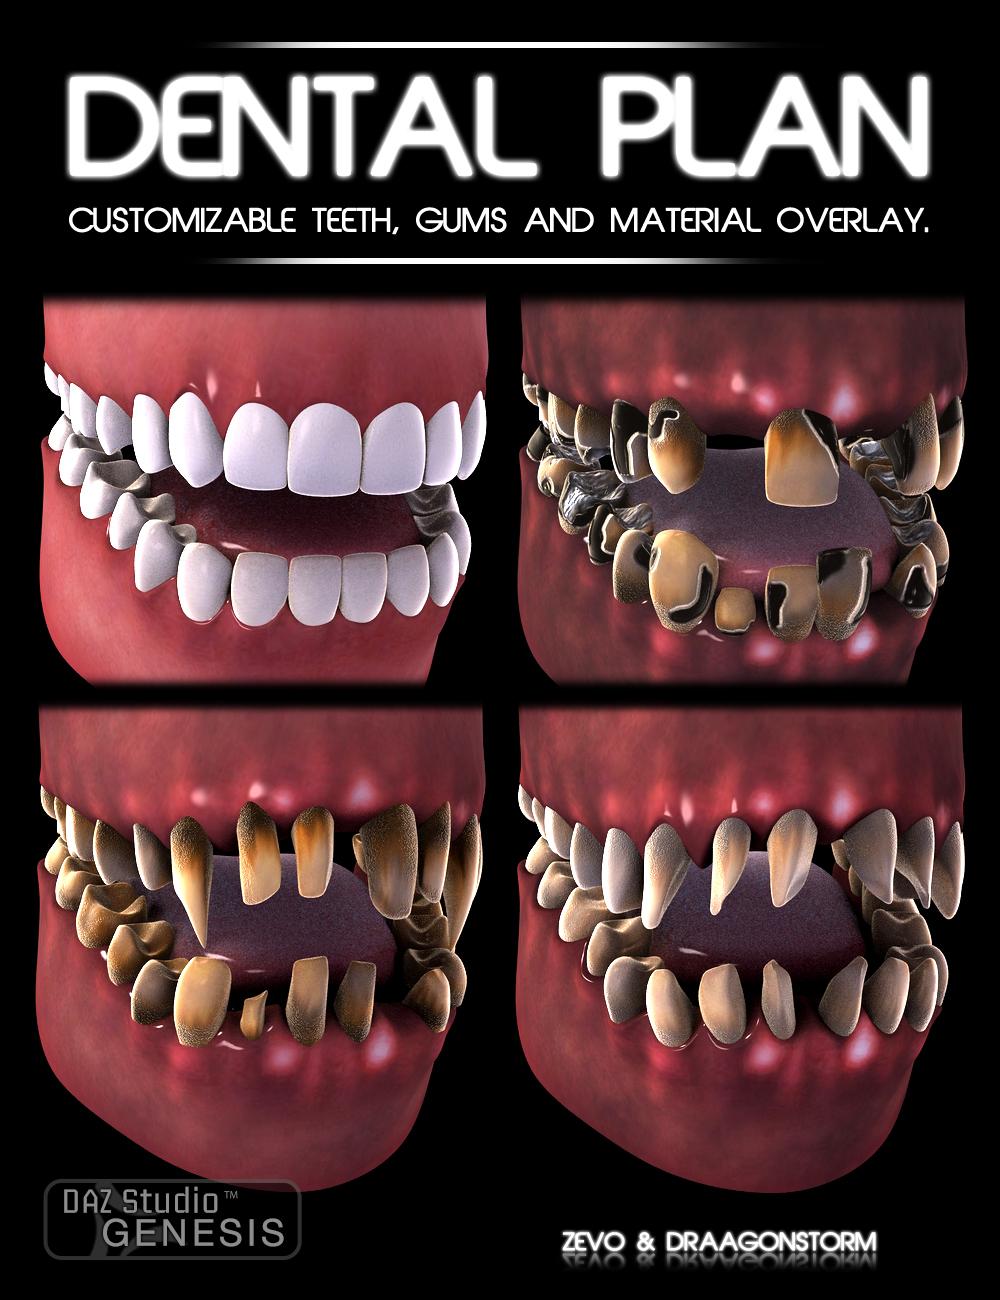 Dental Plan for Genesis by: DraagonStormZev0, 3D Models by Daz 3D